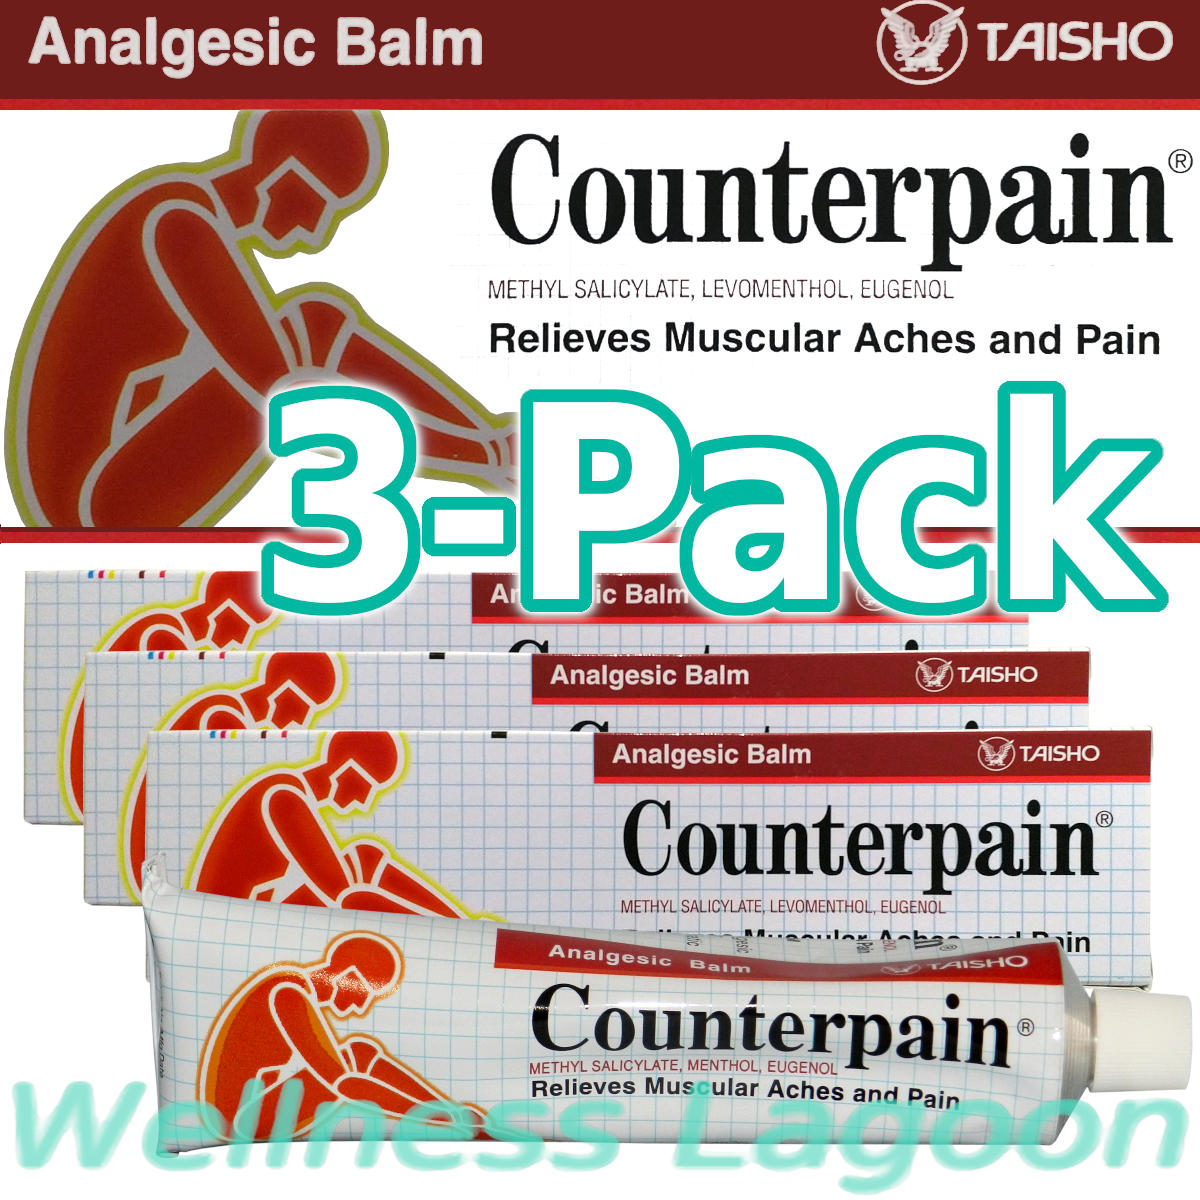 3x Taisho Counterpain Balm Red 120g